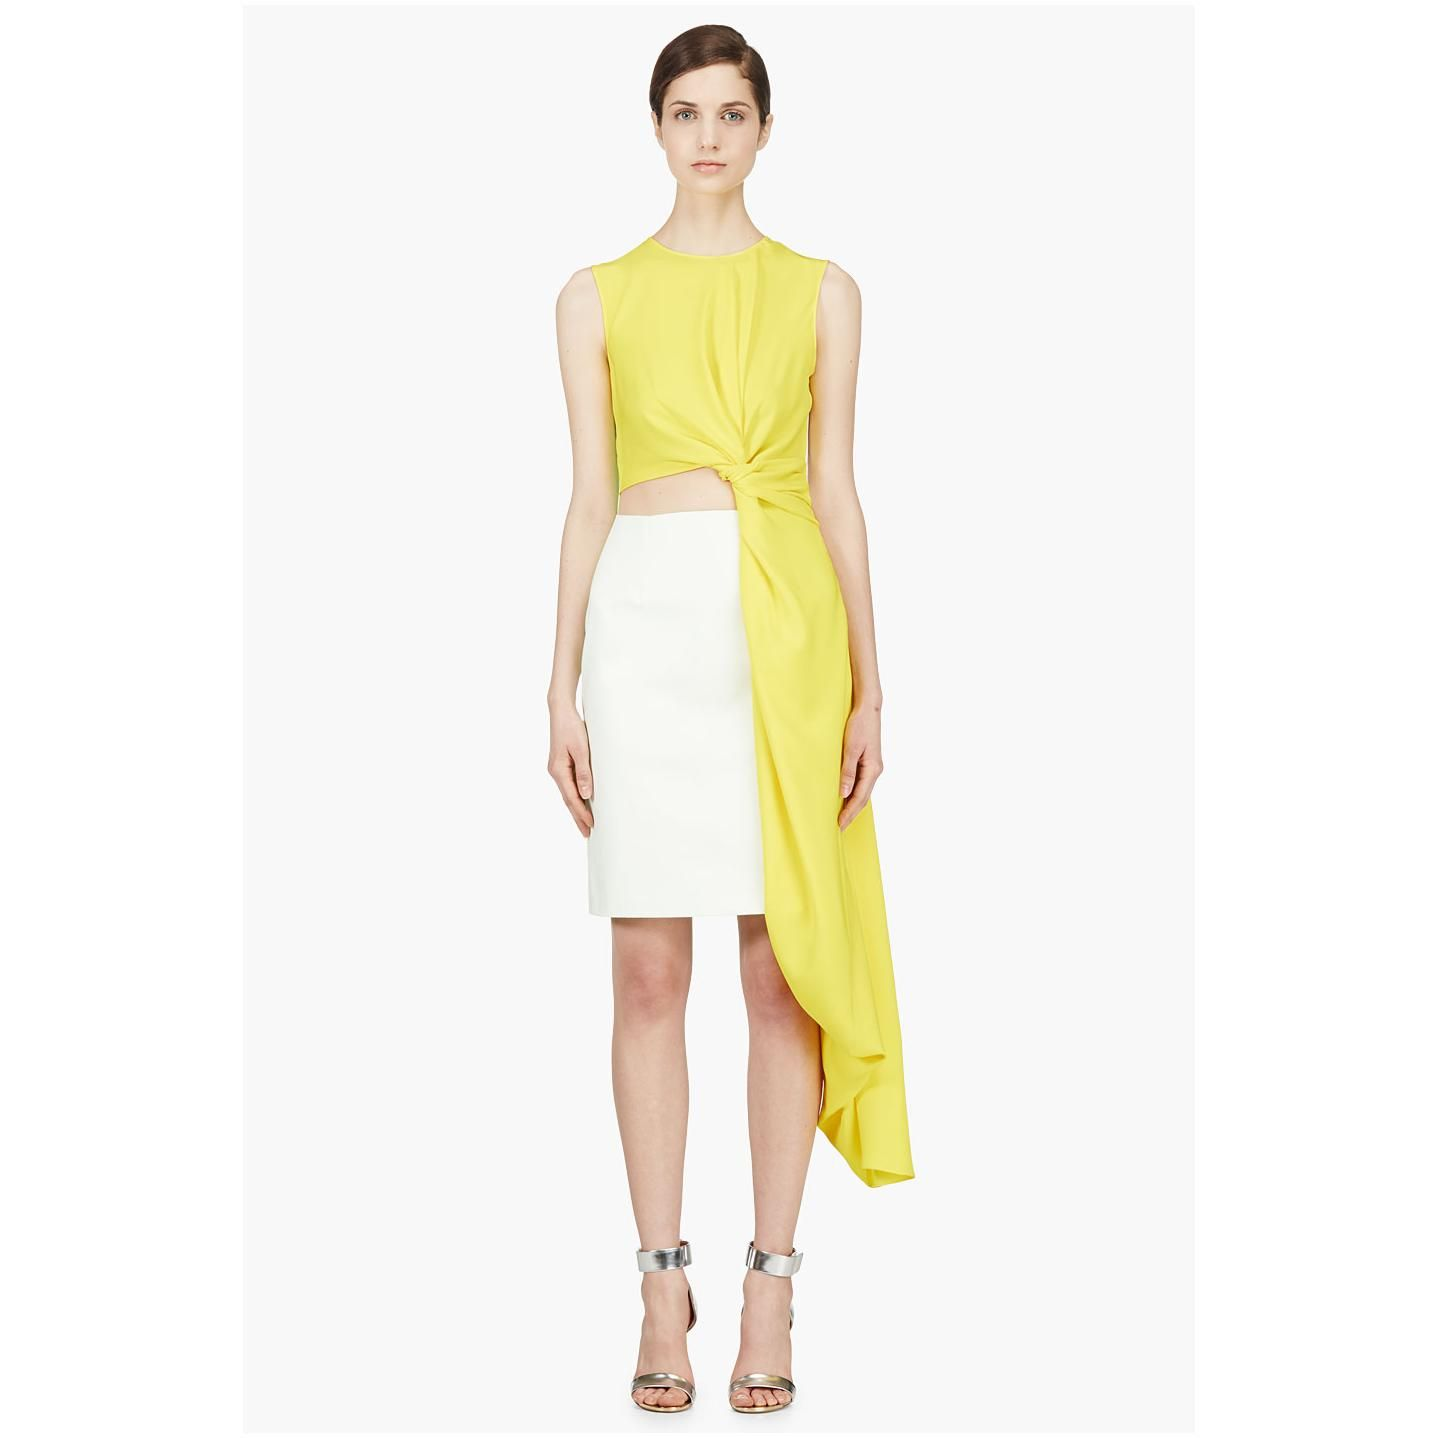 Roksanda ilincic yellow draped colorblock layton dress outfits i